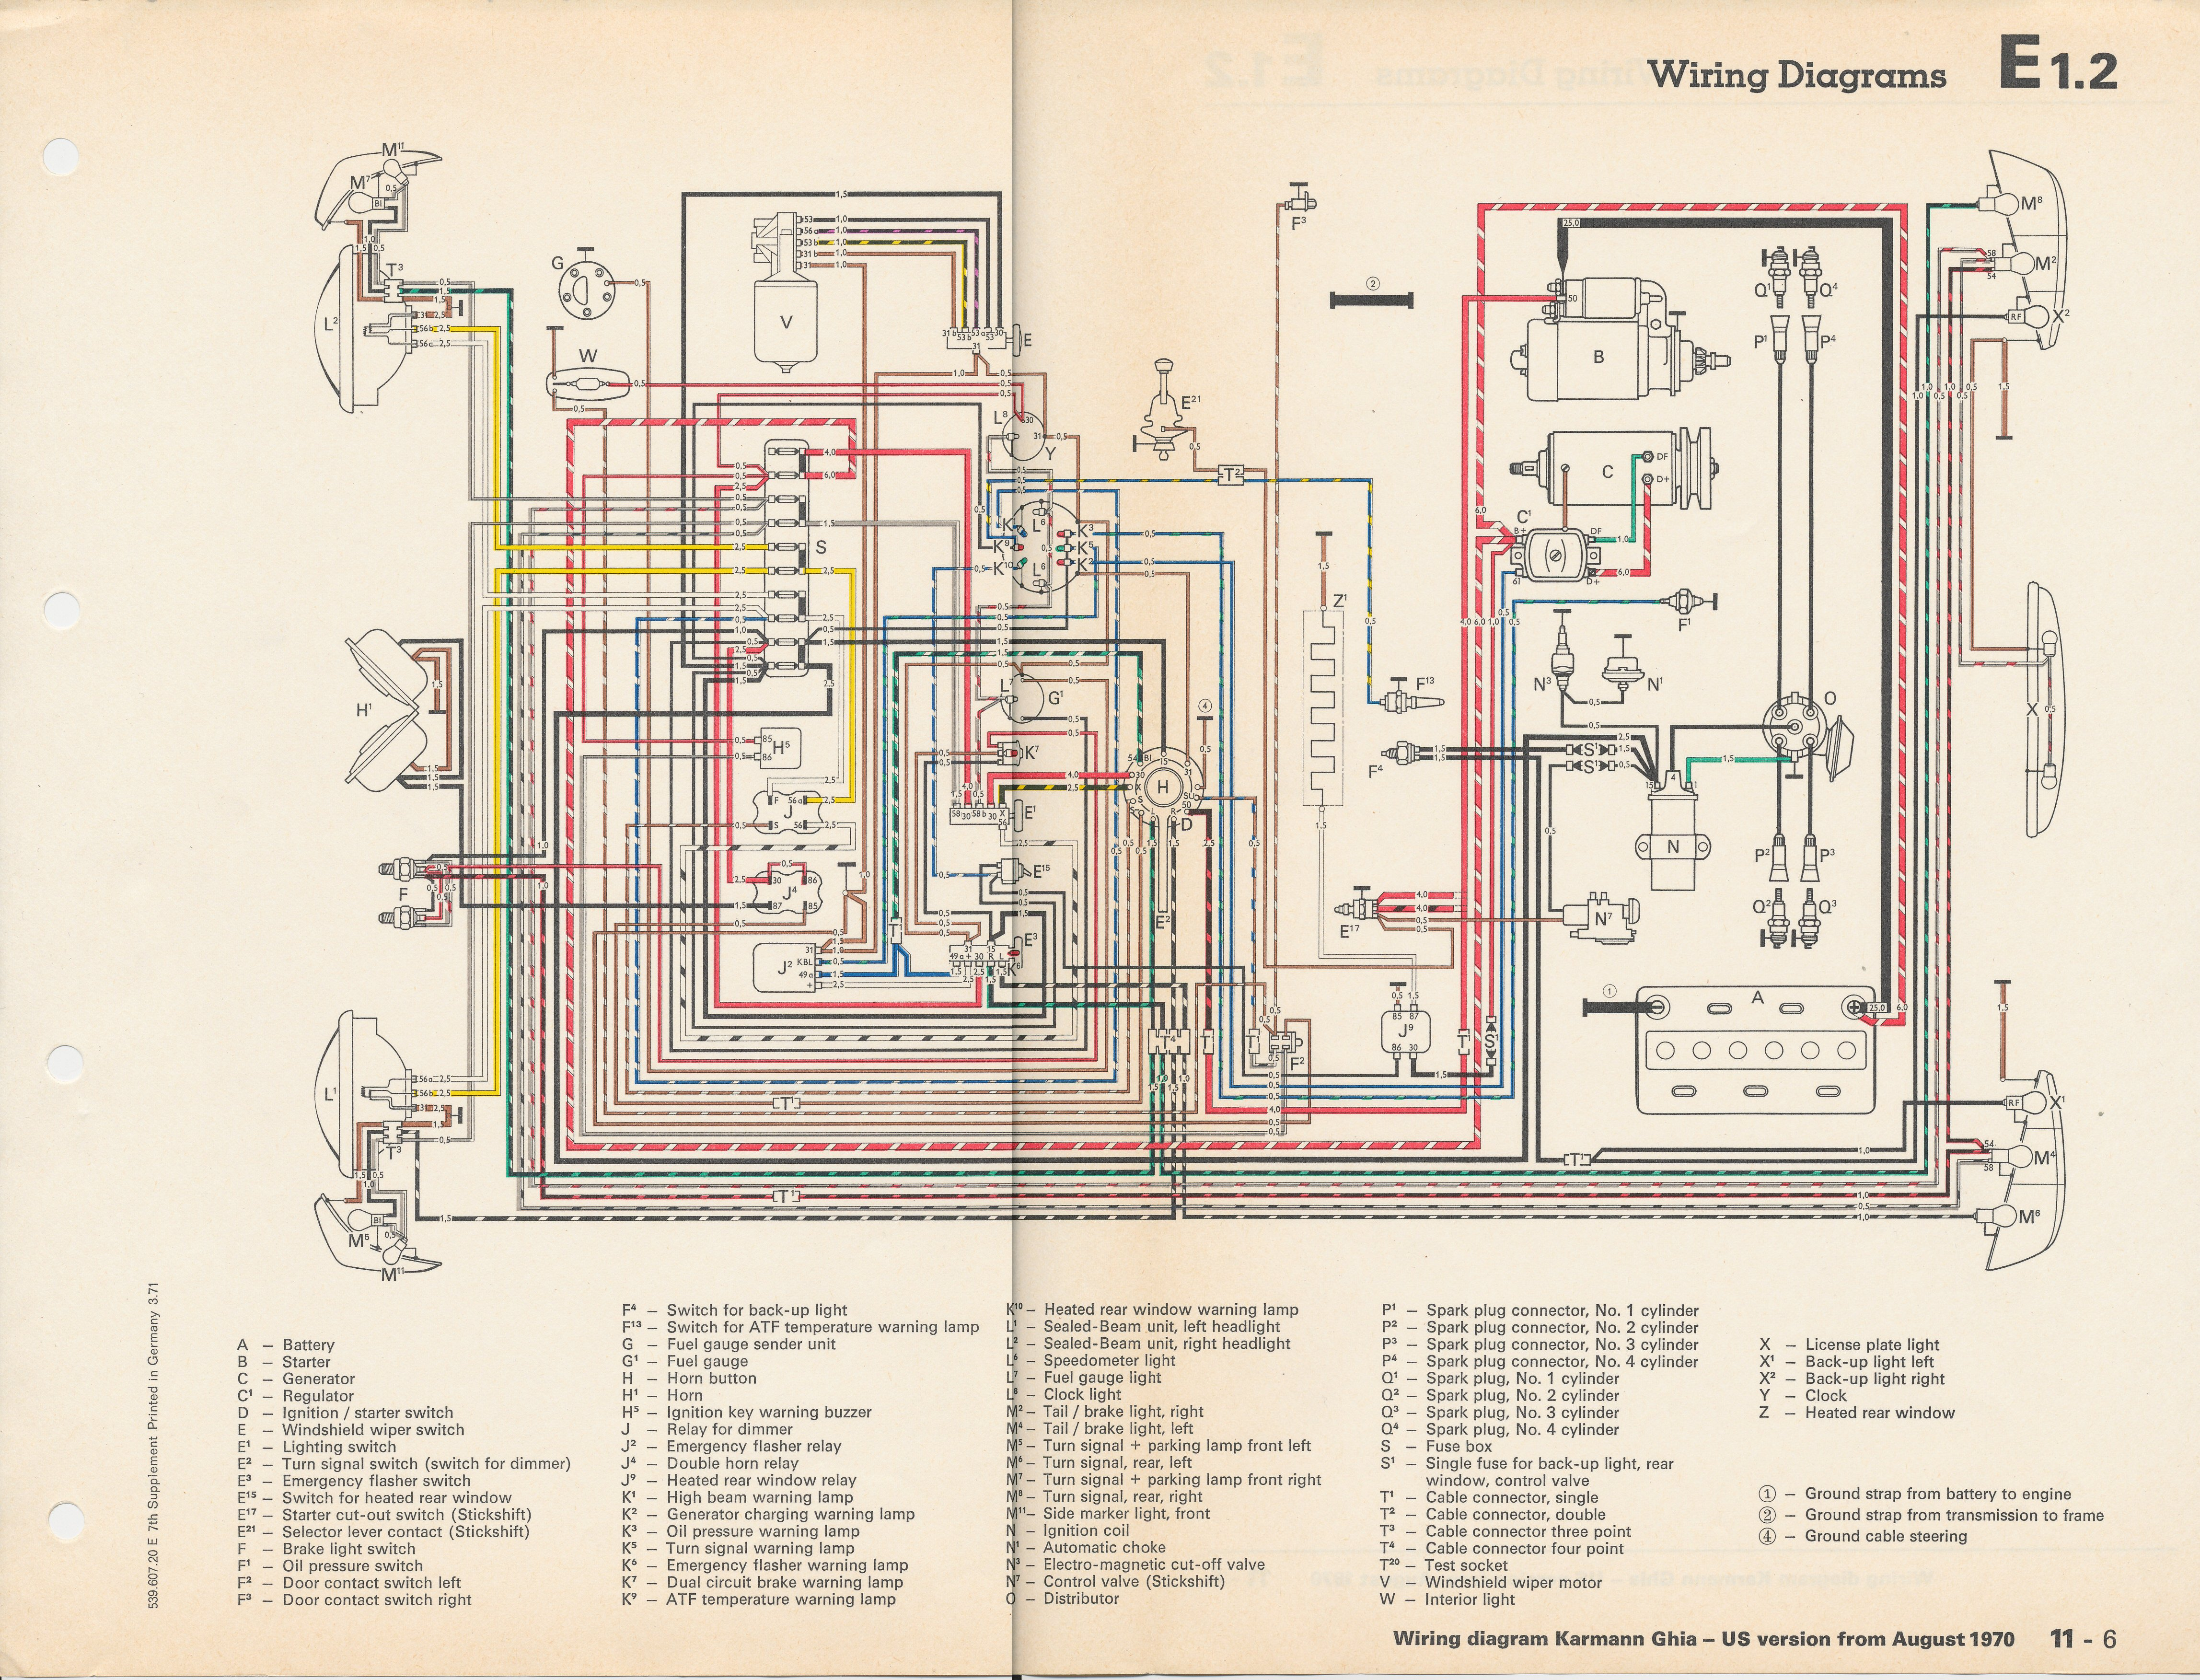 1956 Bentley Wiring Diagram Thesamba Com Karmann Ghia Wiring Diagrams